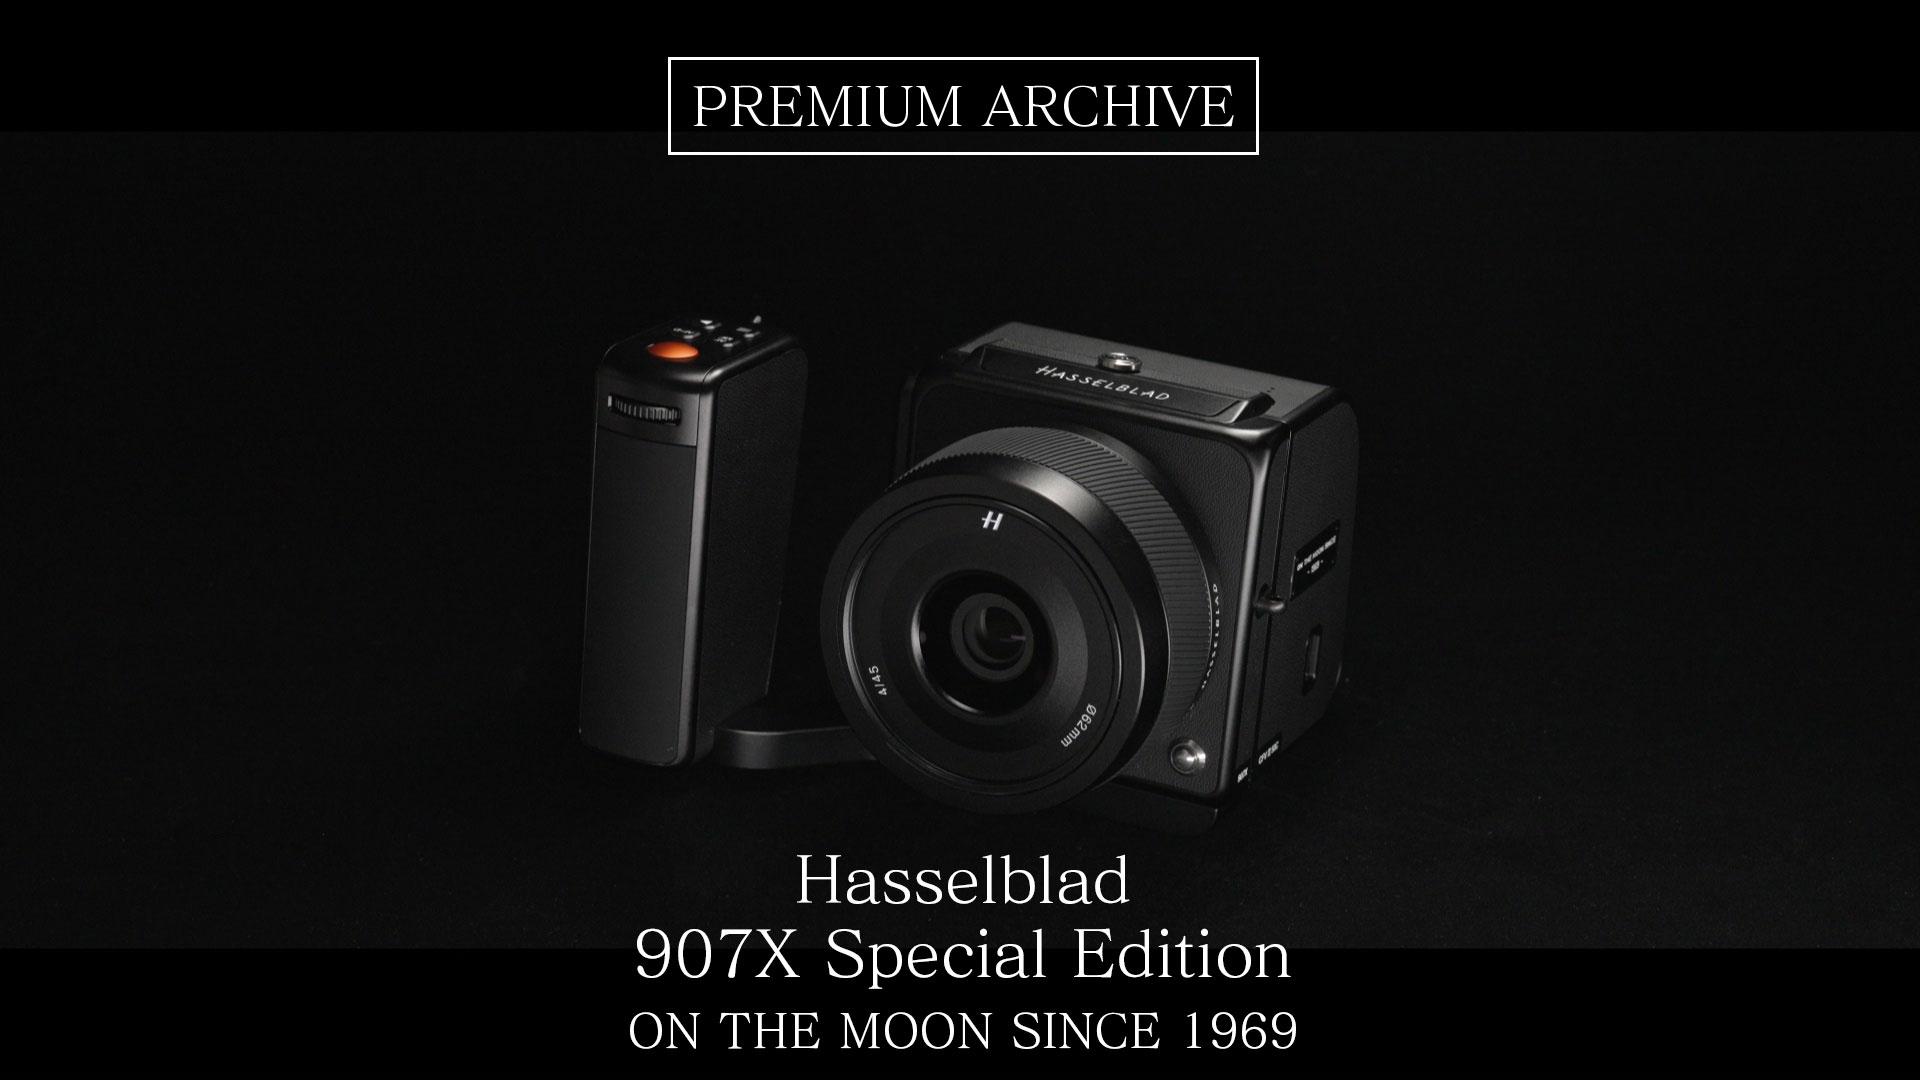 【PREMIUM ARCHIVE #02】HASSELBLAD 907X スペシャルエディション ON THE MOON SINCE 1969 専用アクセサリーセット